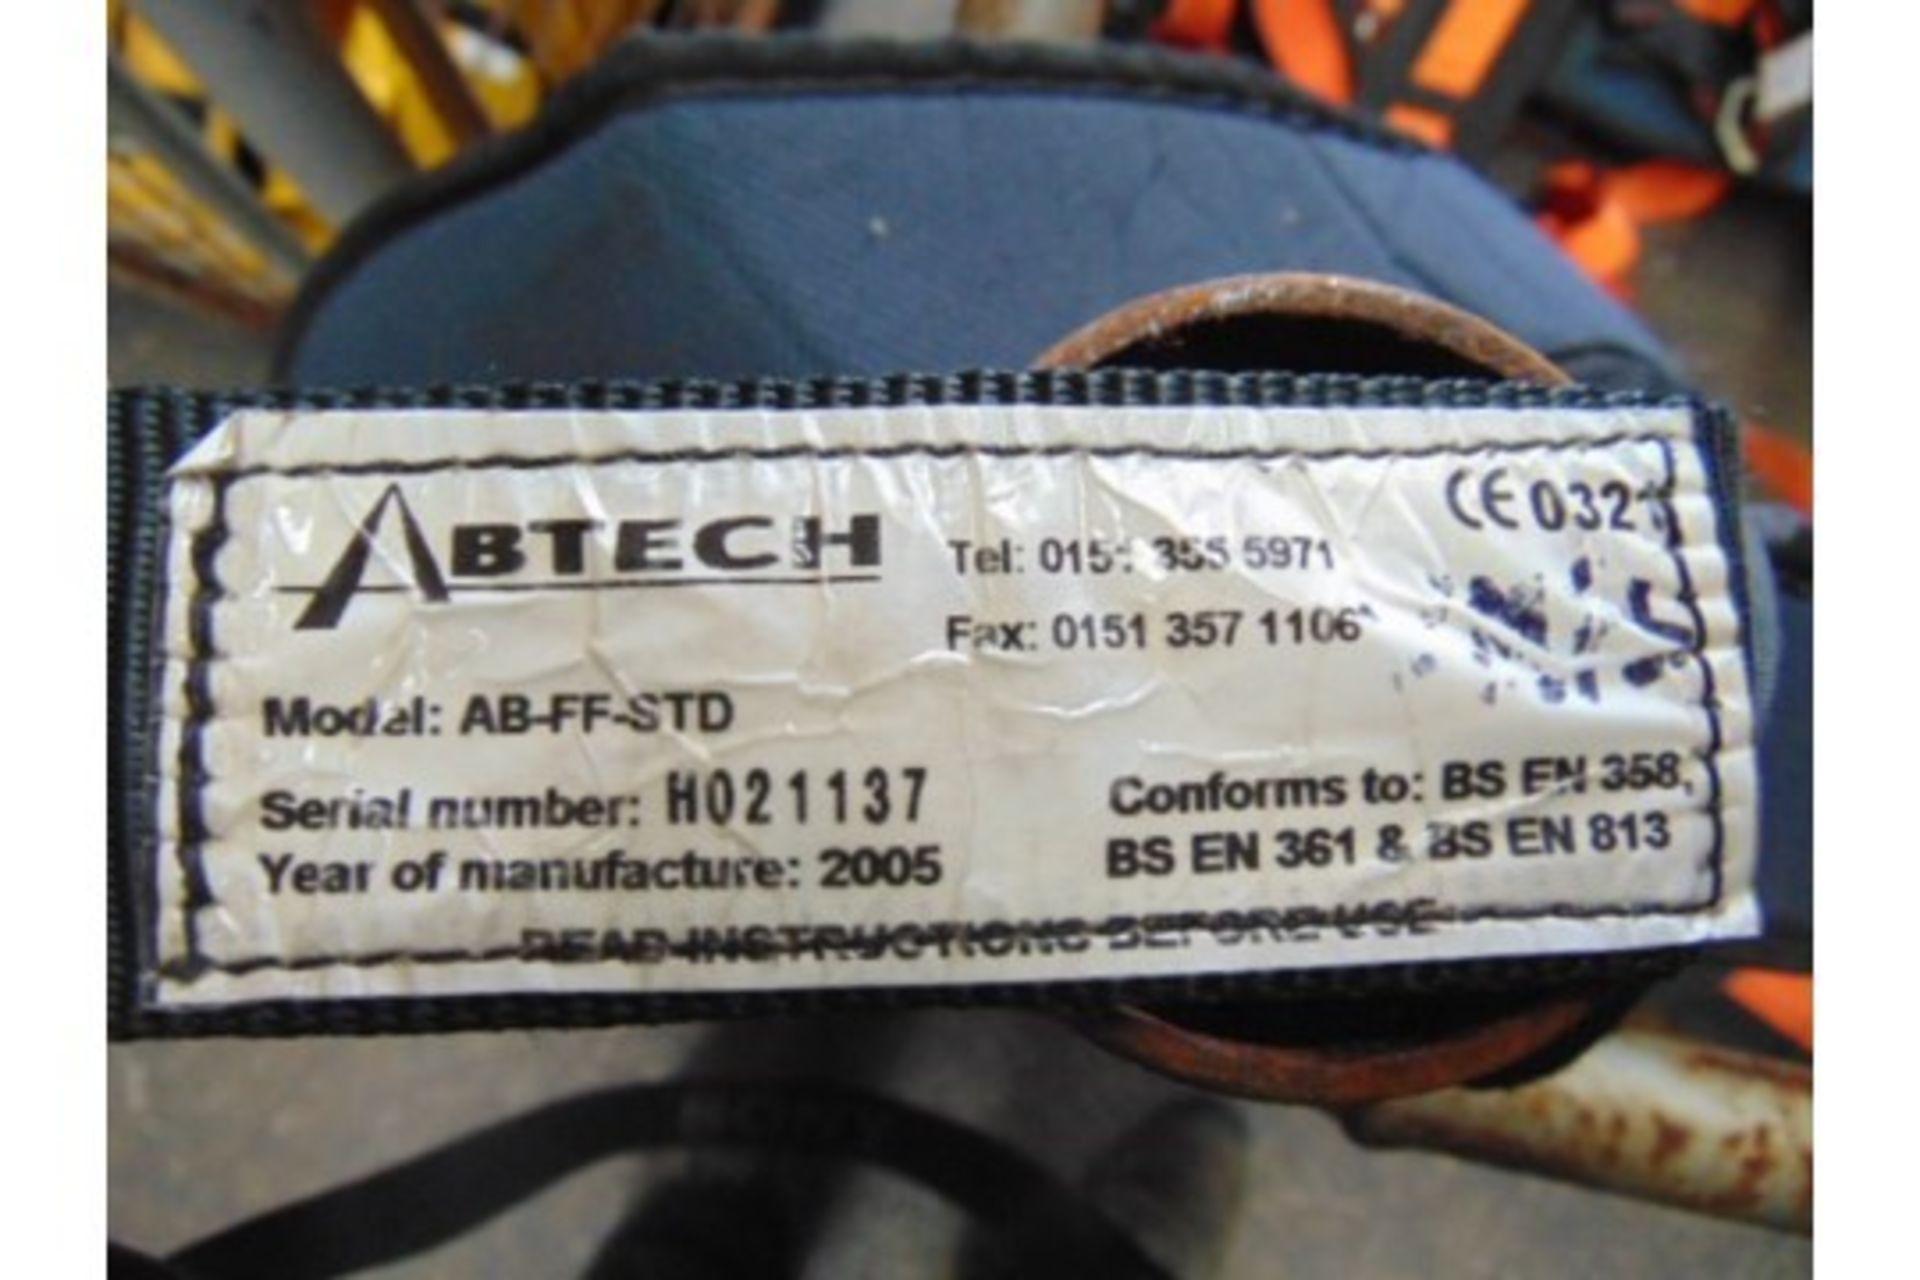 Lot 26624 - 9 x Abtech AB-FF-STD Rescue Harnesses.